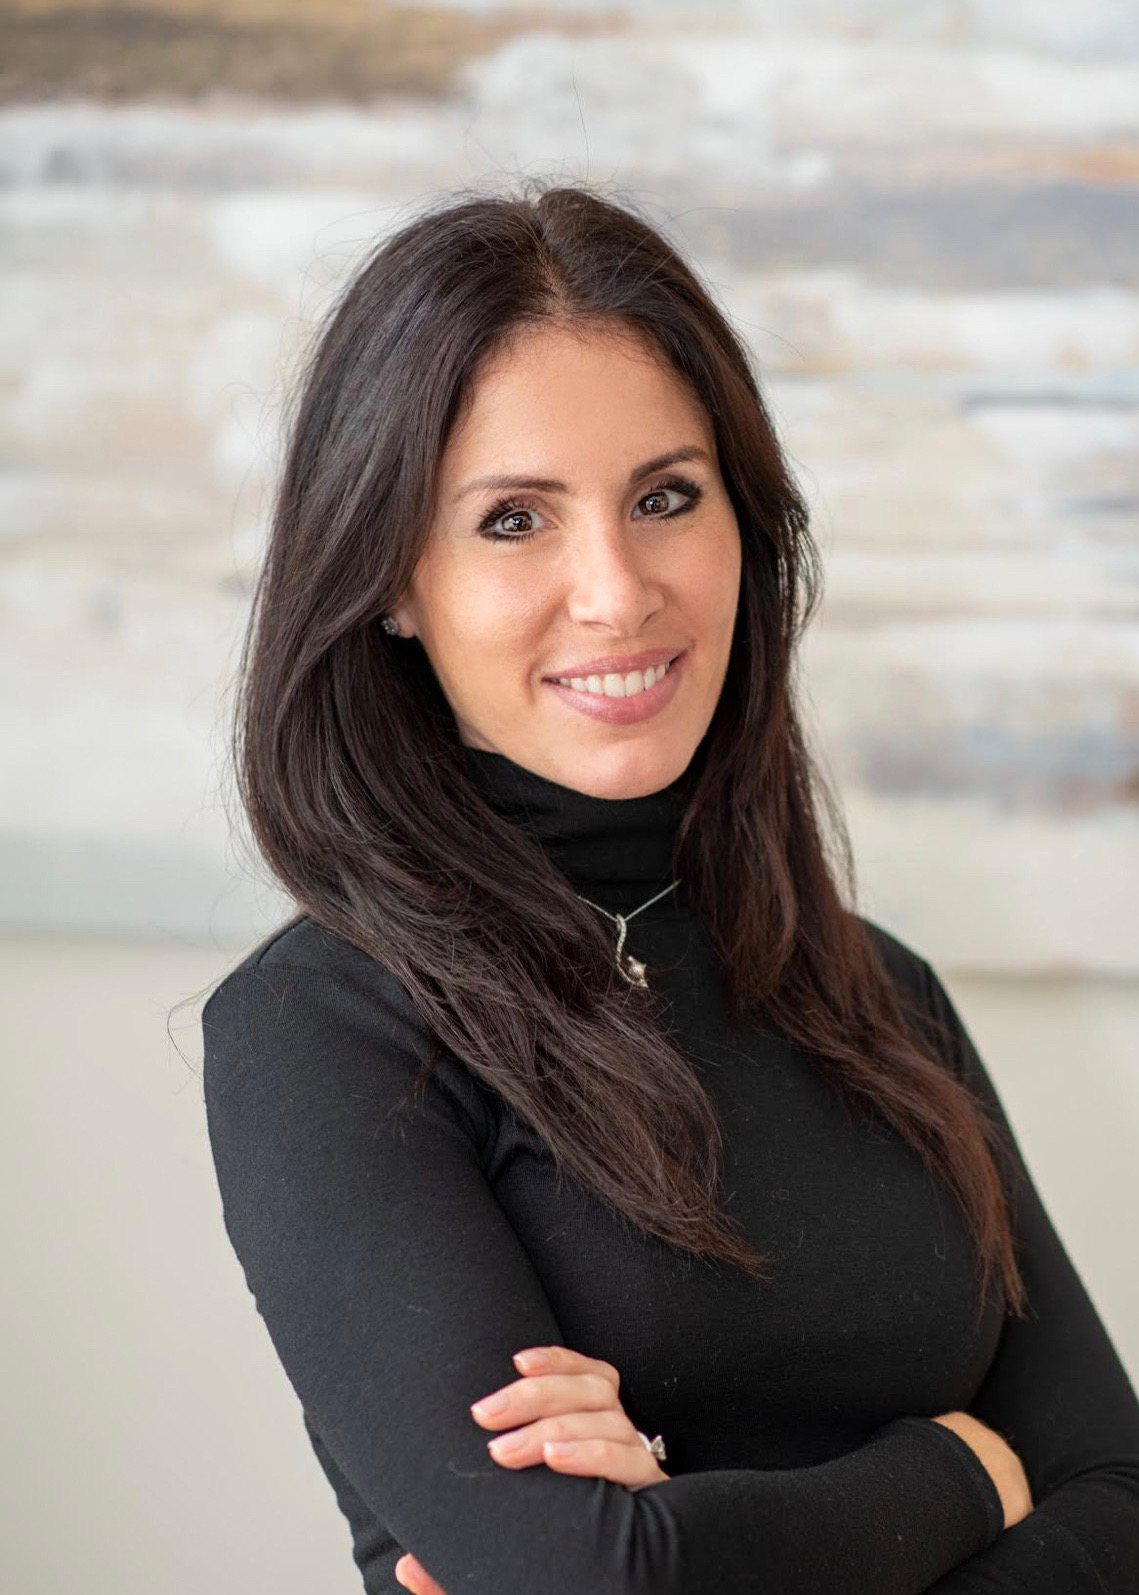 Maria Zeito